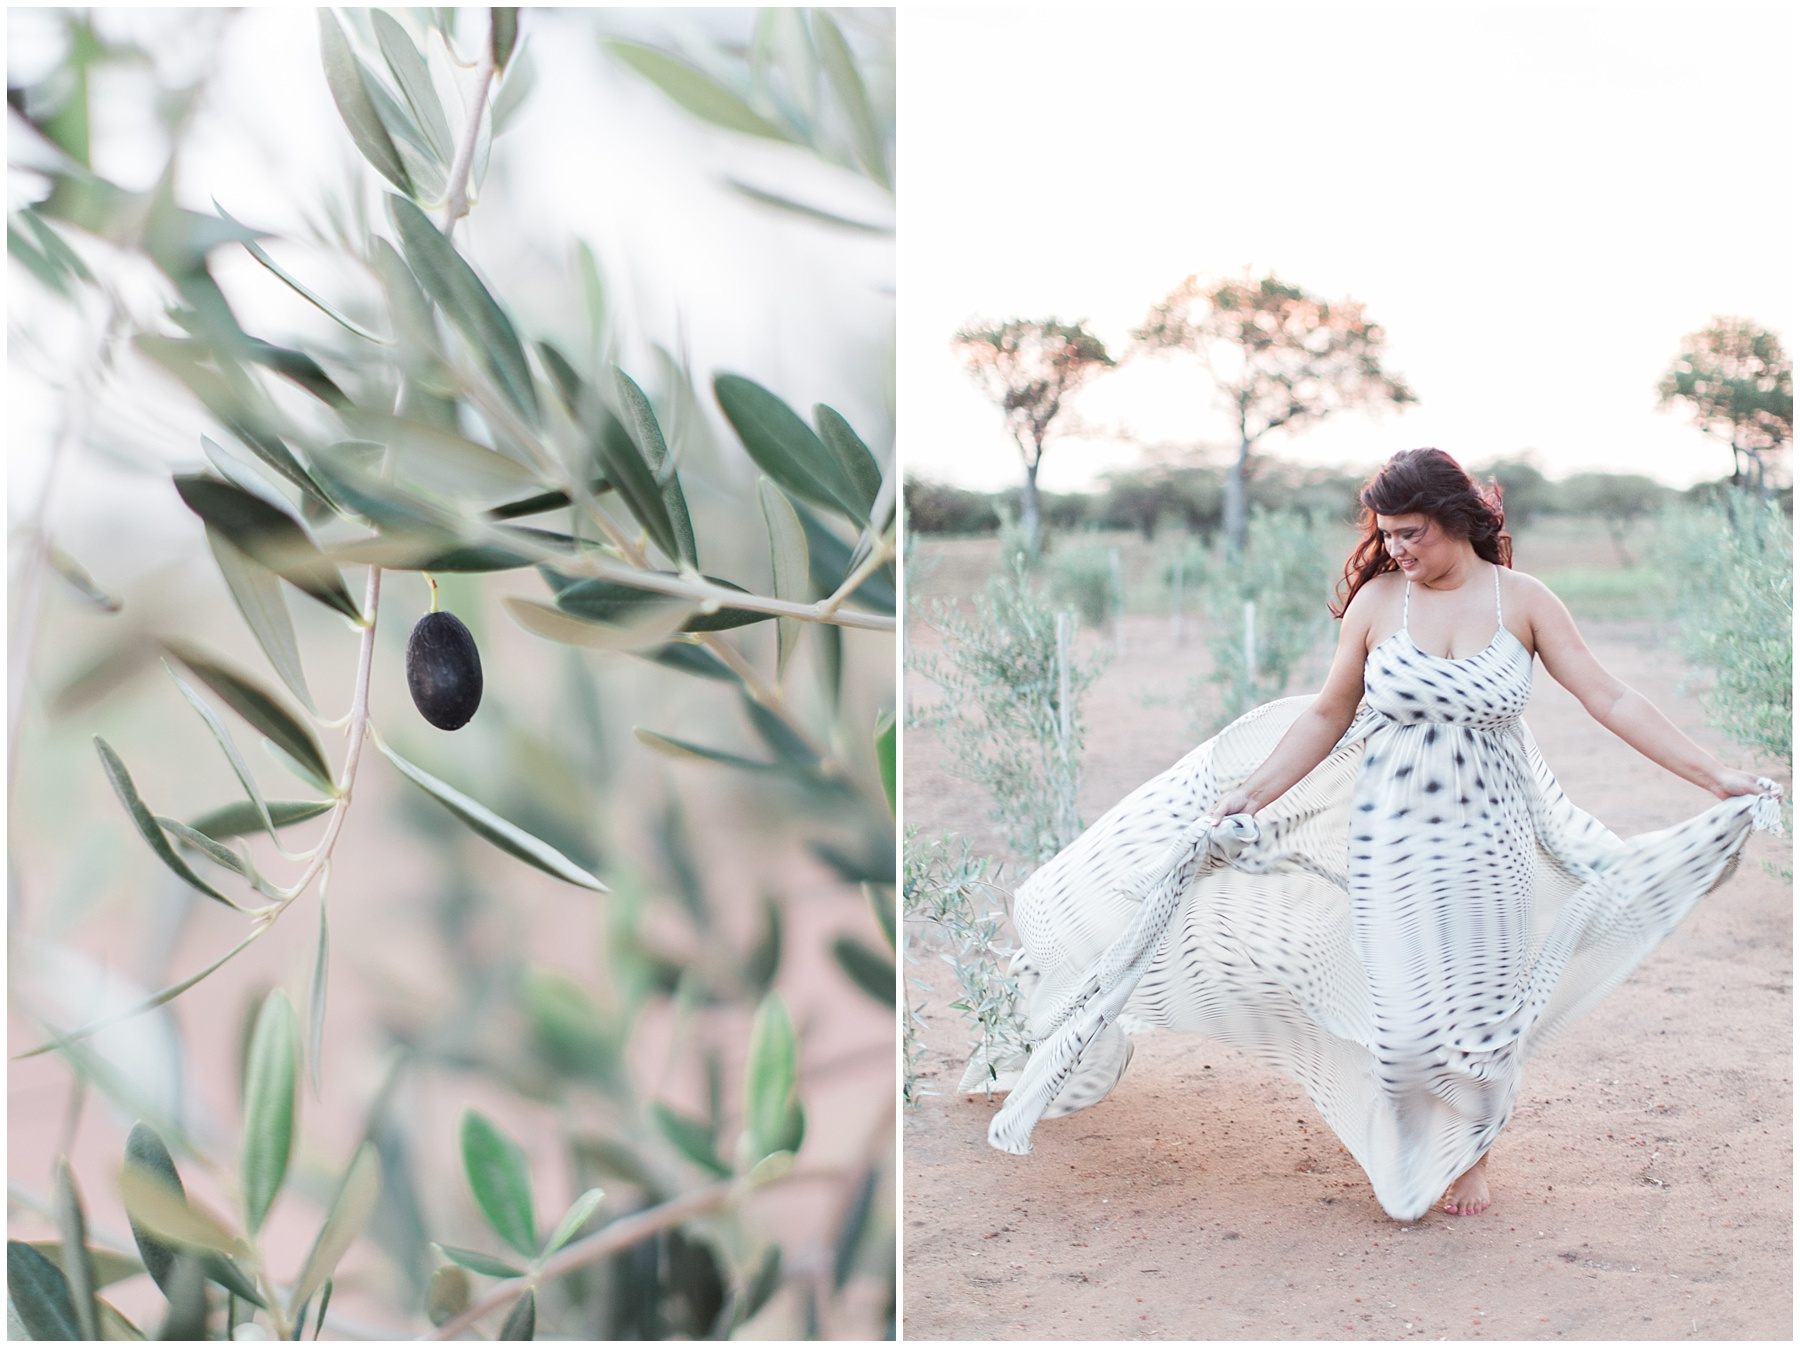 AliciaLandman_JoleneandZander_Wedding_The Pretty Blog_0409.jpg